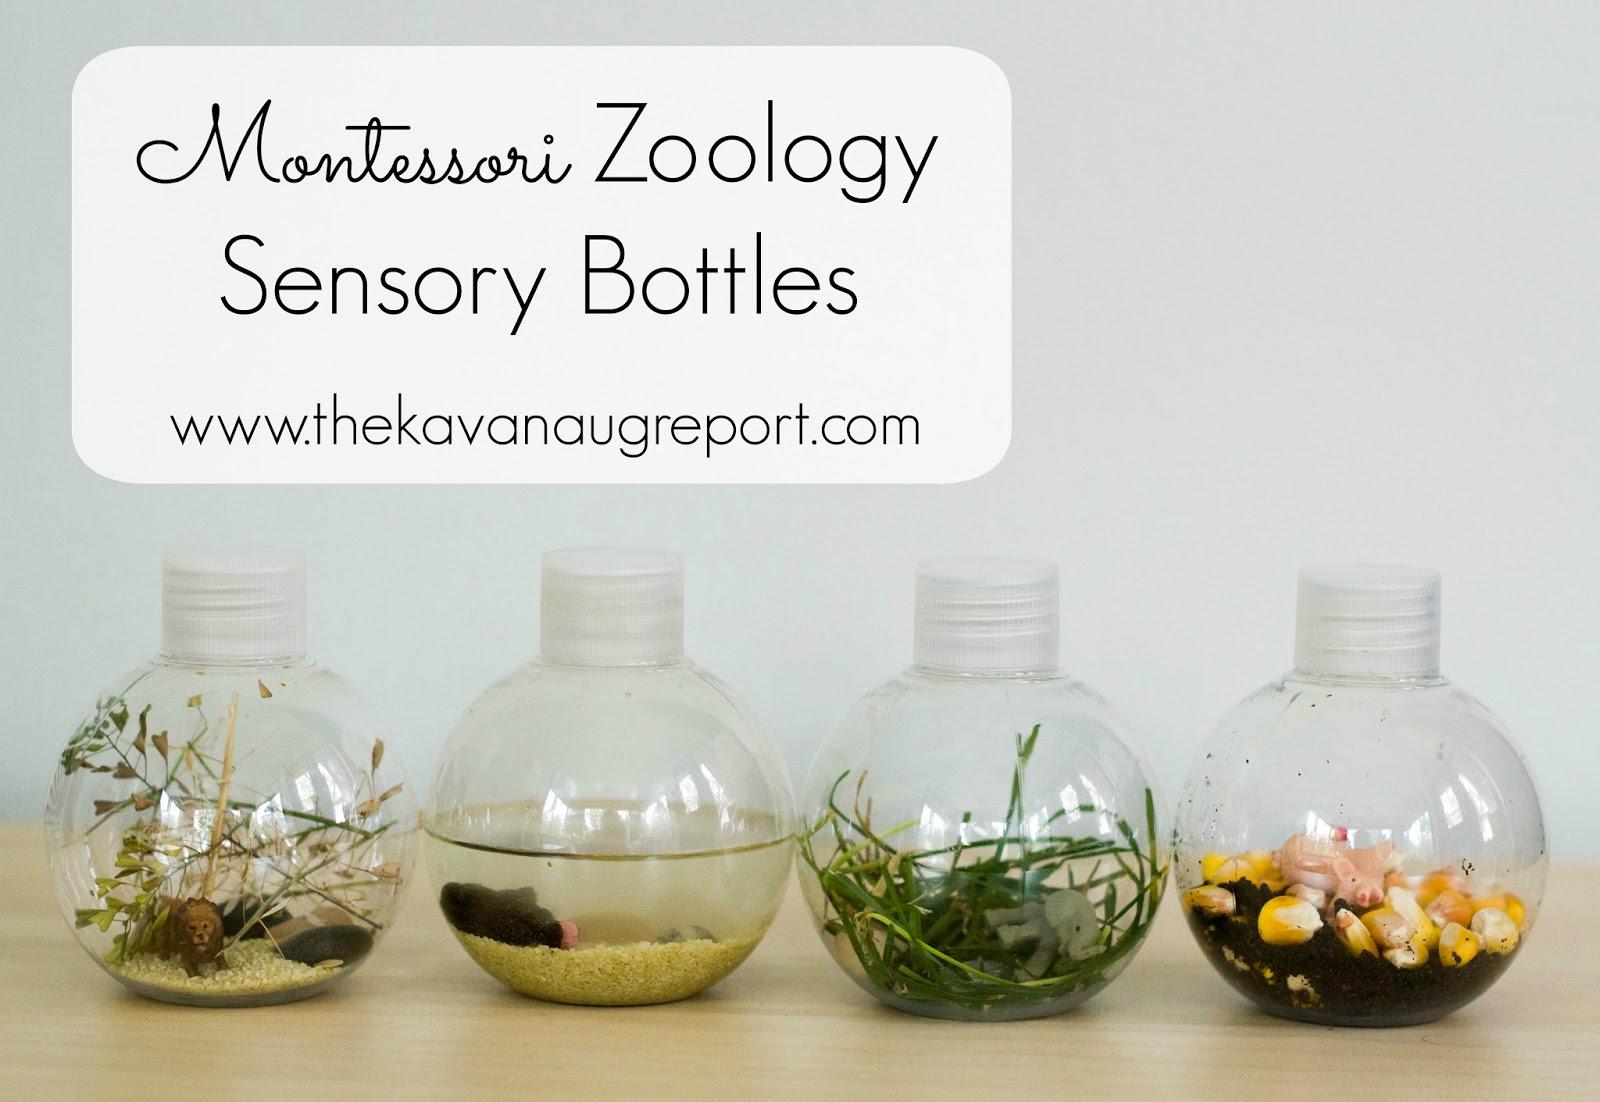 Zoology Sensory Bottles for Montessori Babies